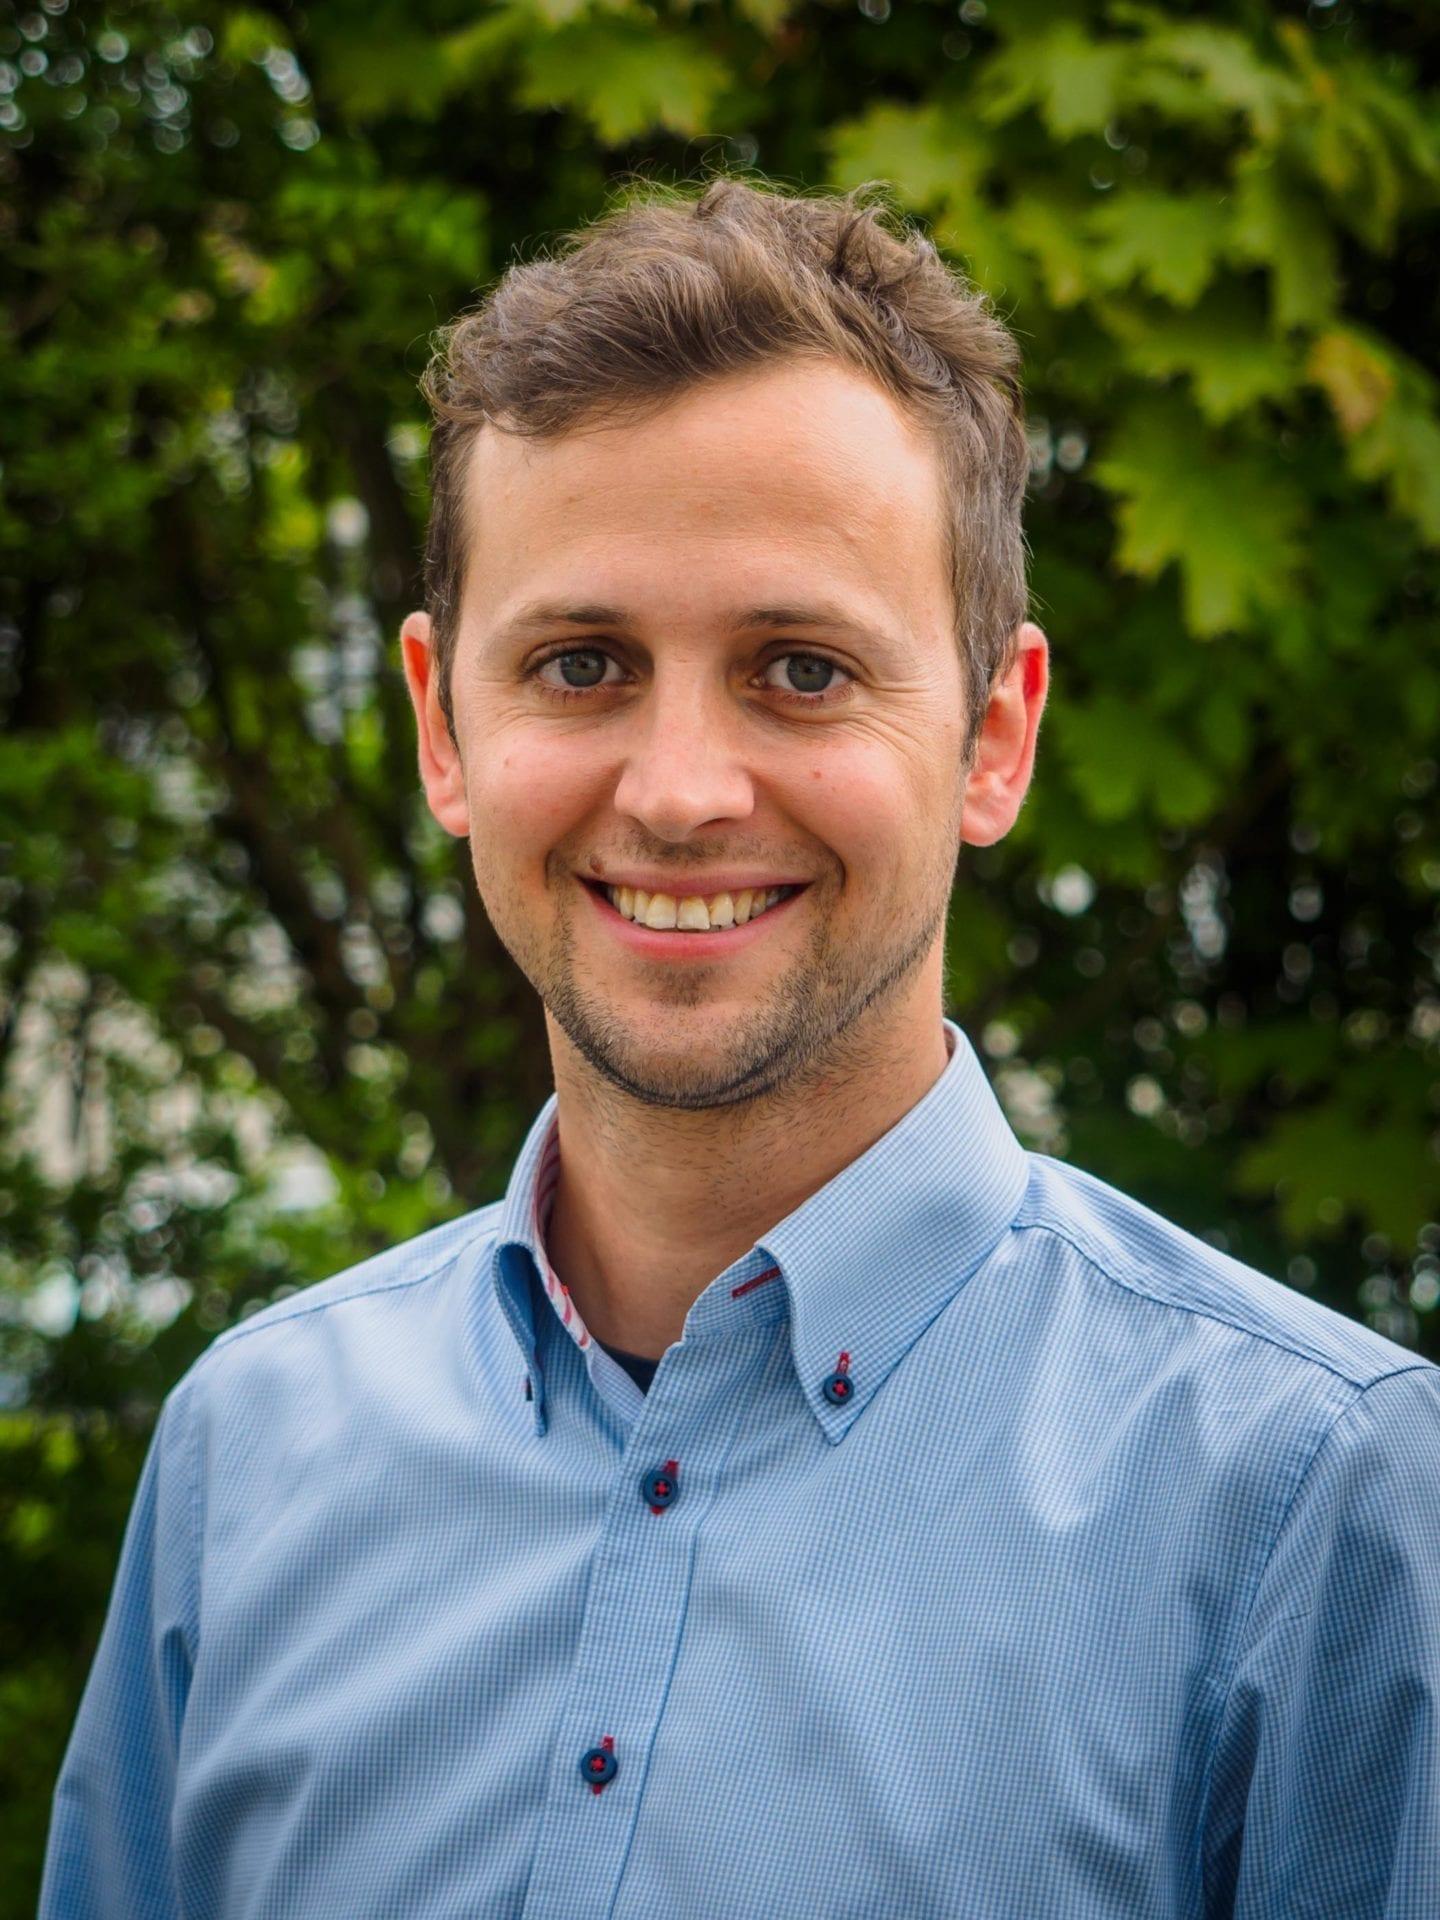 Benjamin Seckinger